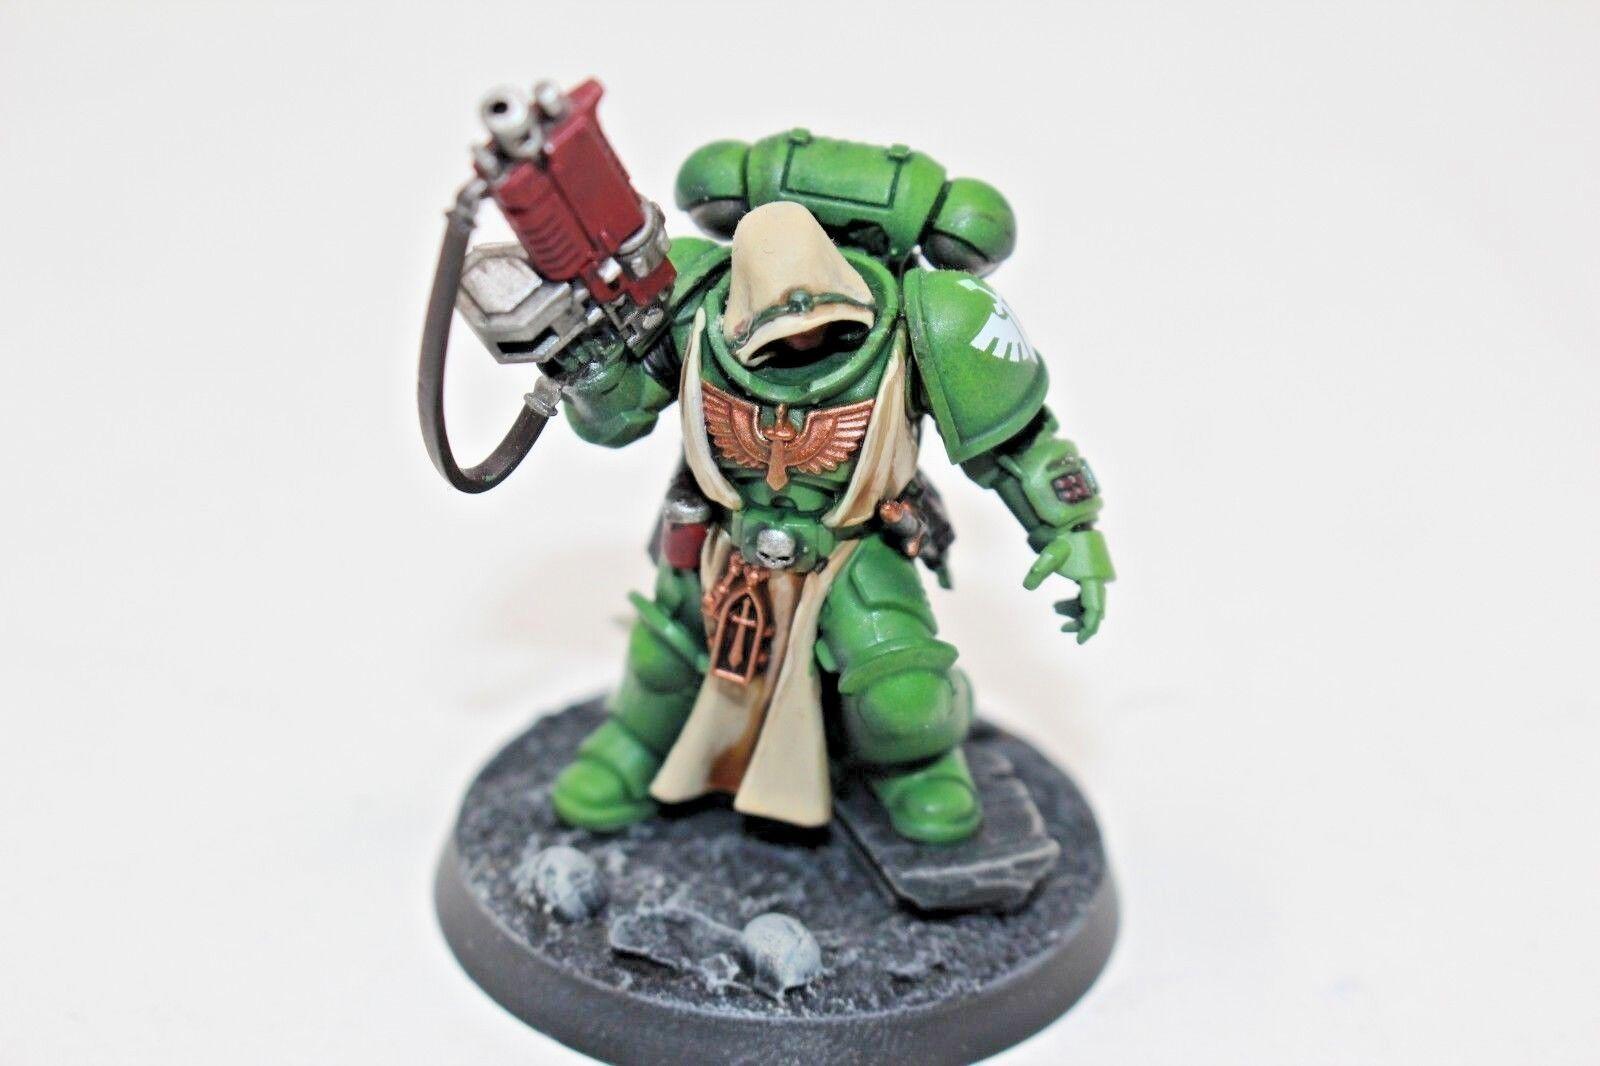 Warhammer spazio Marines Dark Angels Primaris Lieutenant Well  Painted - JYS72  outlet